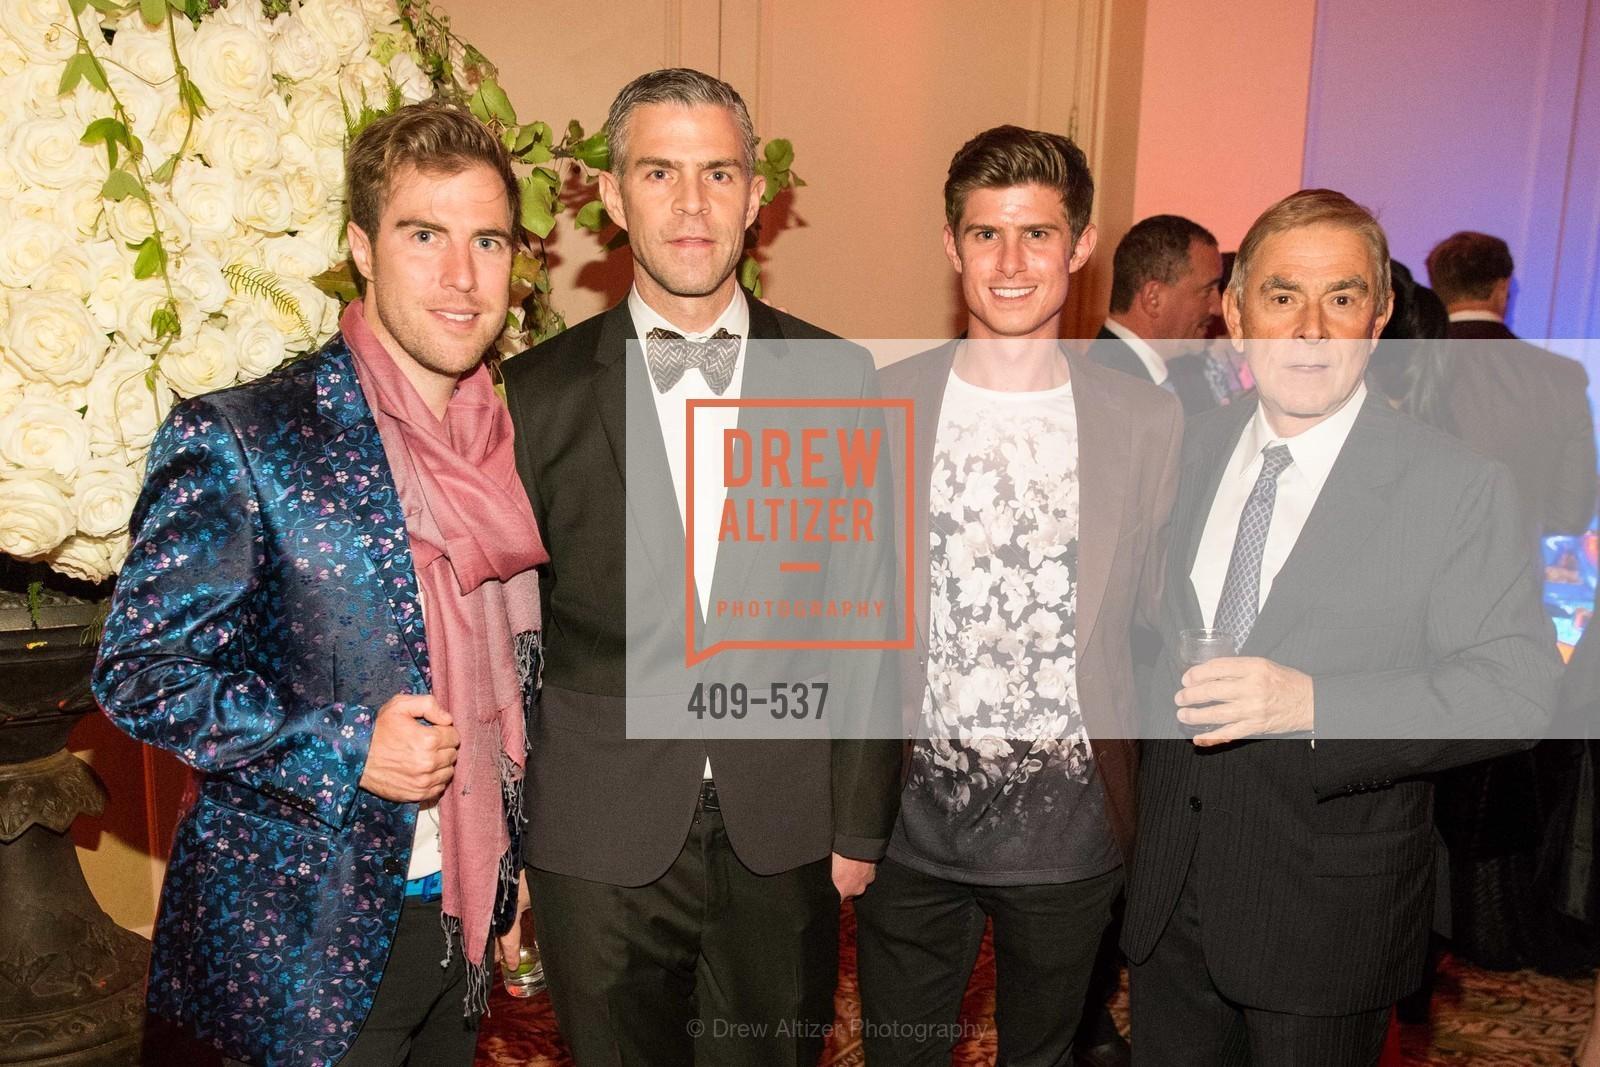 Matthew Kimball, James Rogers, Michael Roderick, John Cello, Photo #409-537